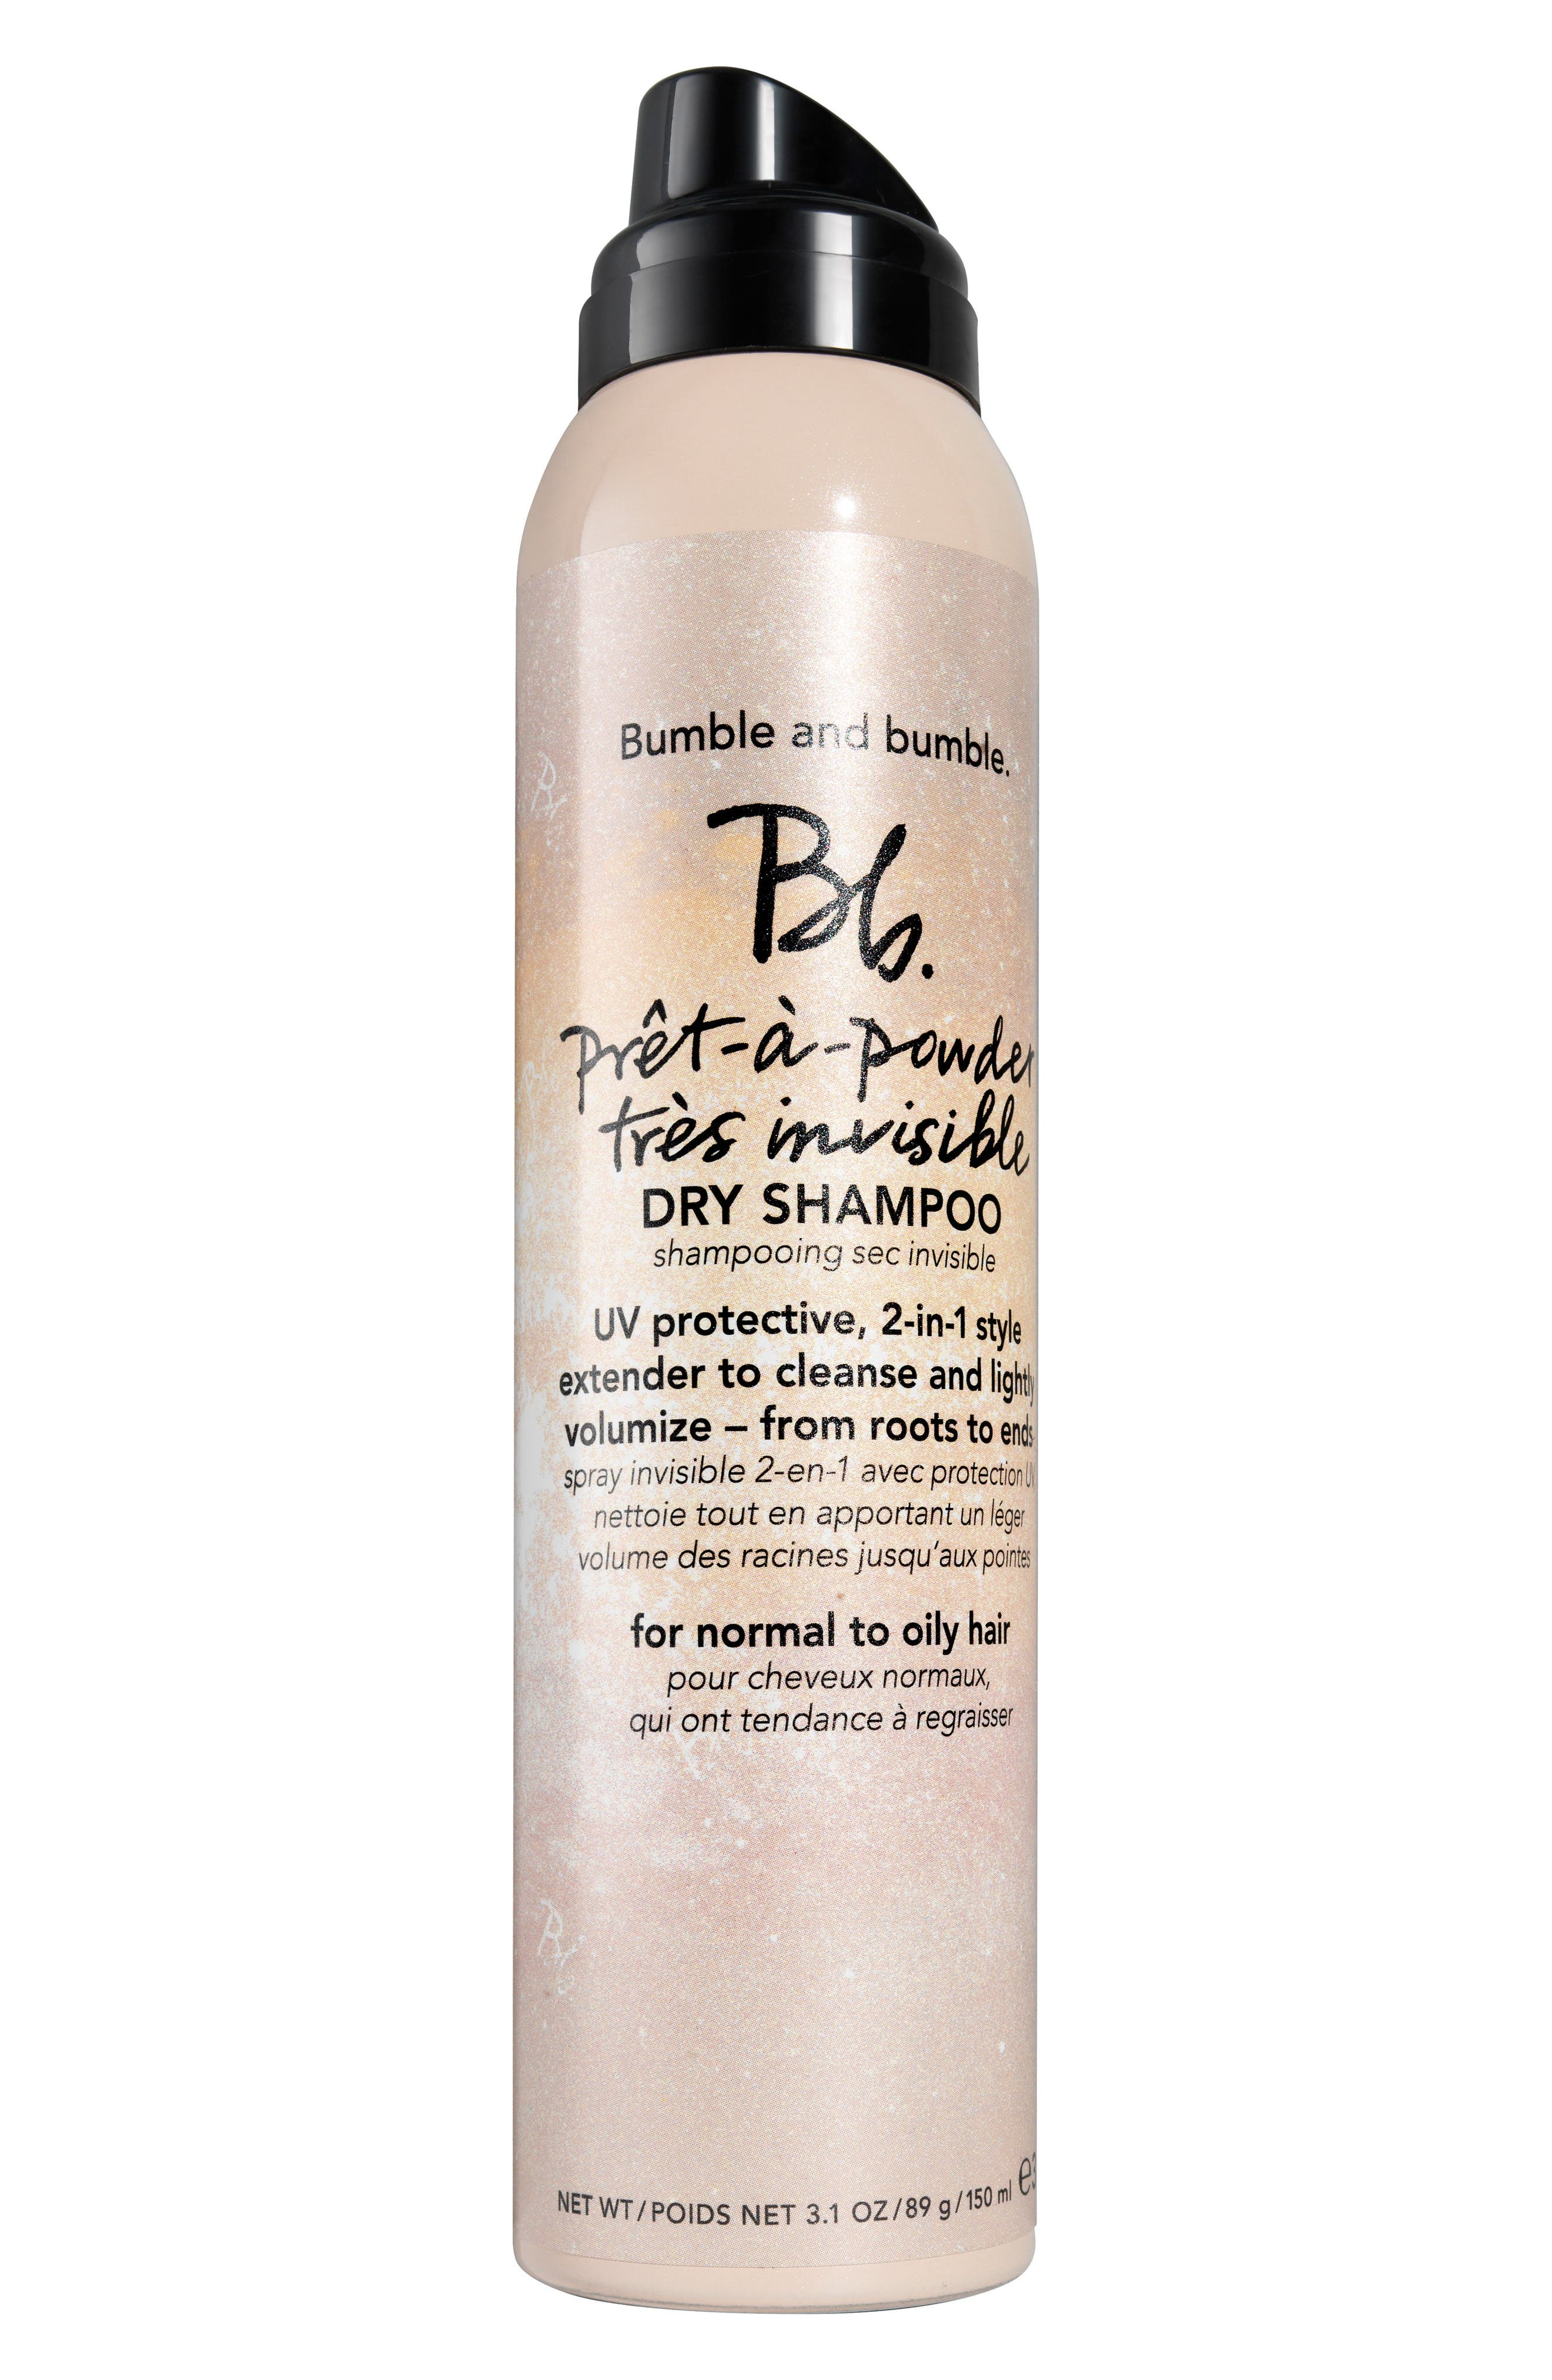 Prêt-a-Powder Très Invisible Dry Shampoo,                         Main,                         color, No Color